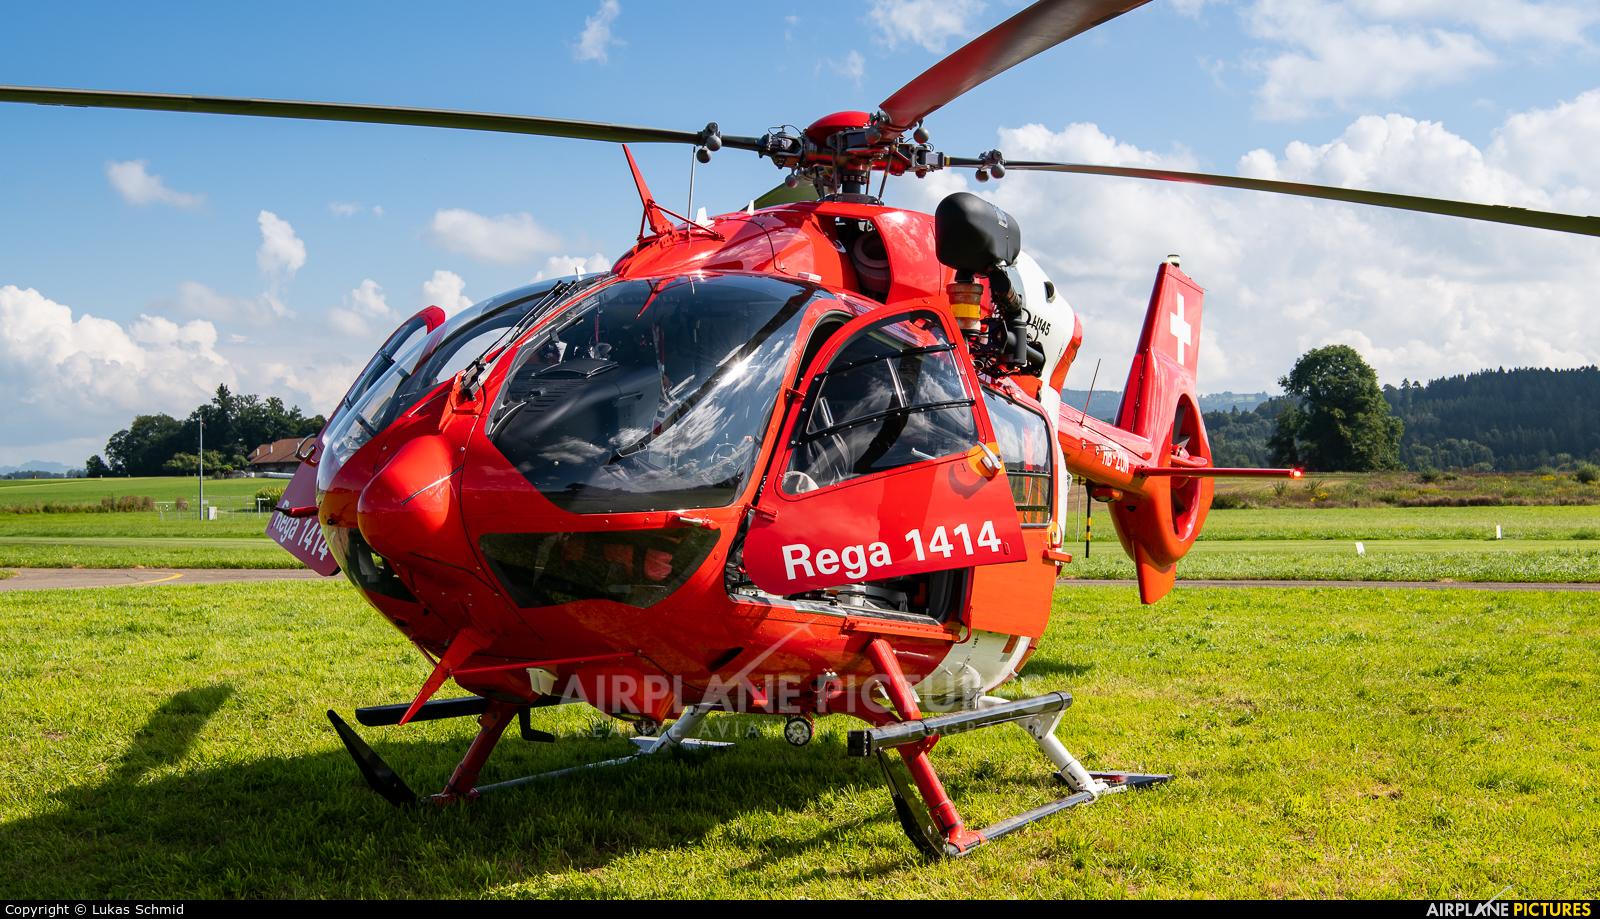 REGA Swiss Air Ambulance  HB-ZQN aircraft at Off Airport - Switzerland